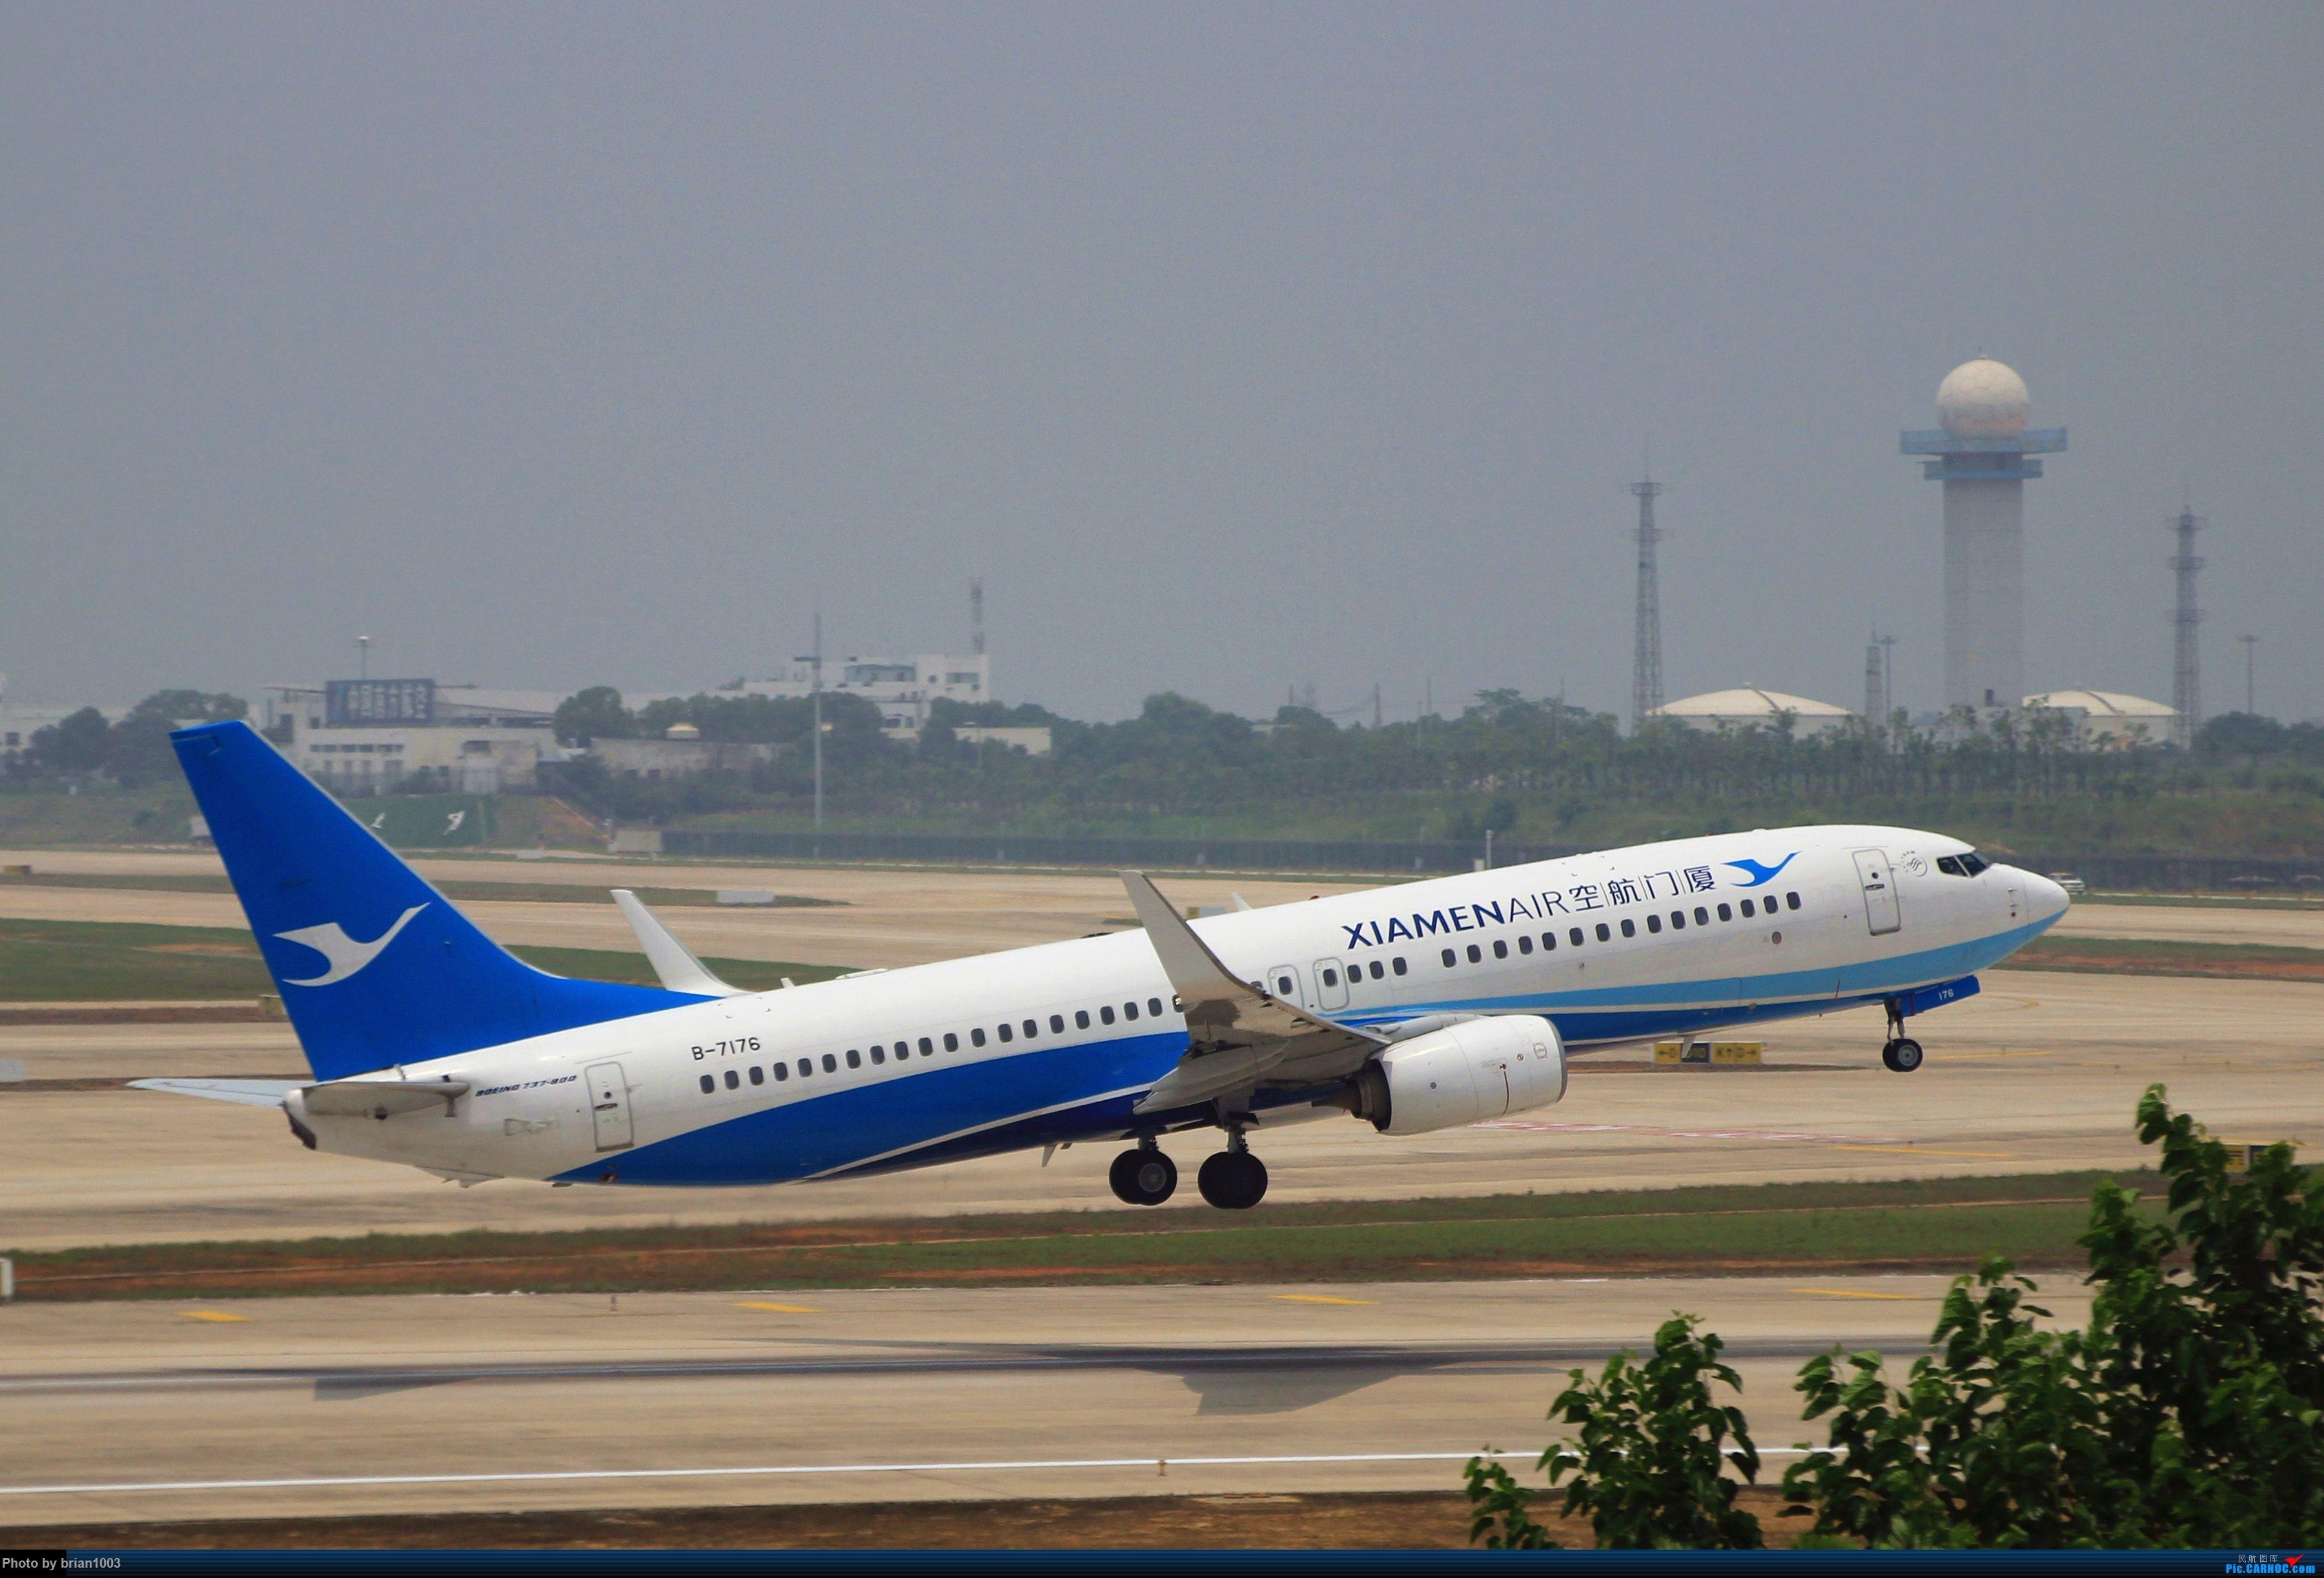 Re:[原创]WUH武汉天河机场拍机之二跑最后忙碌时 BOEING 737-800 B-7176 中国武汉天河国际机场